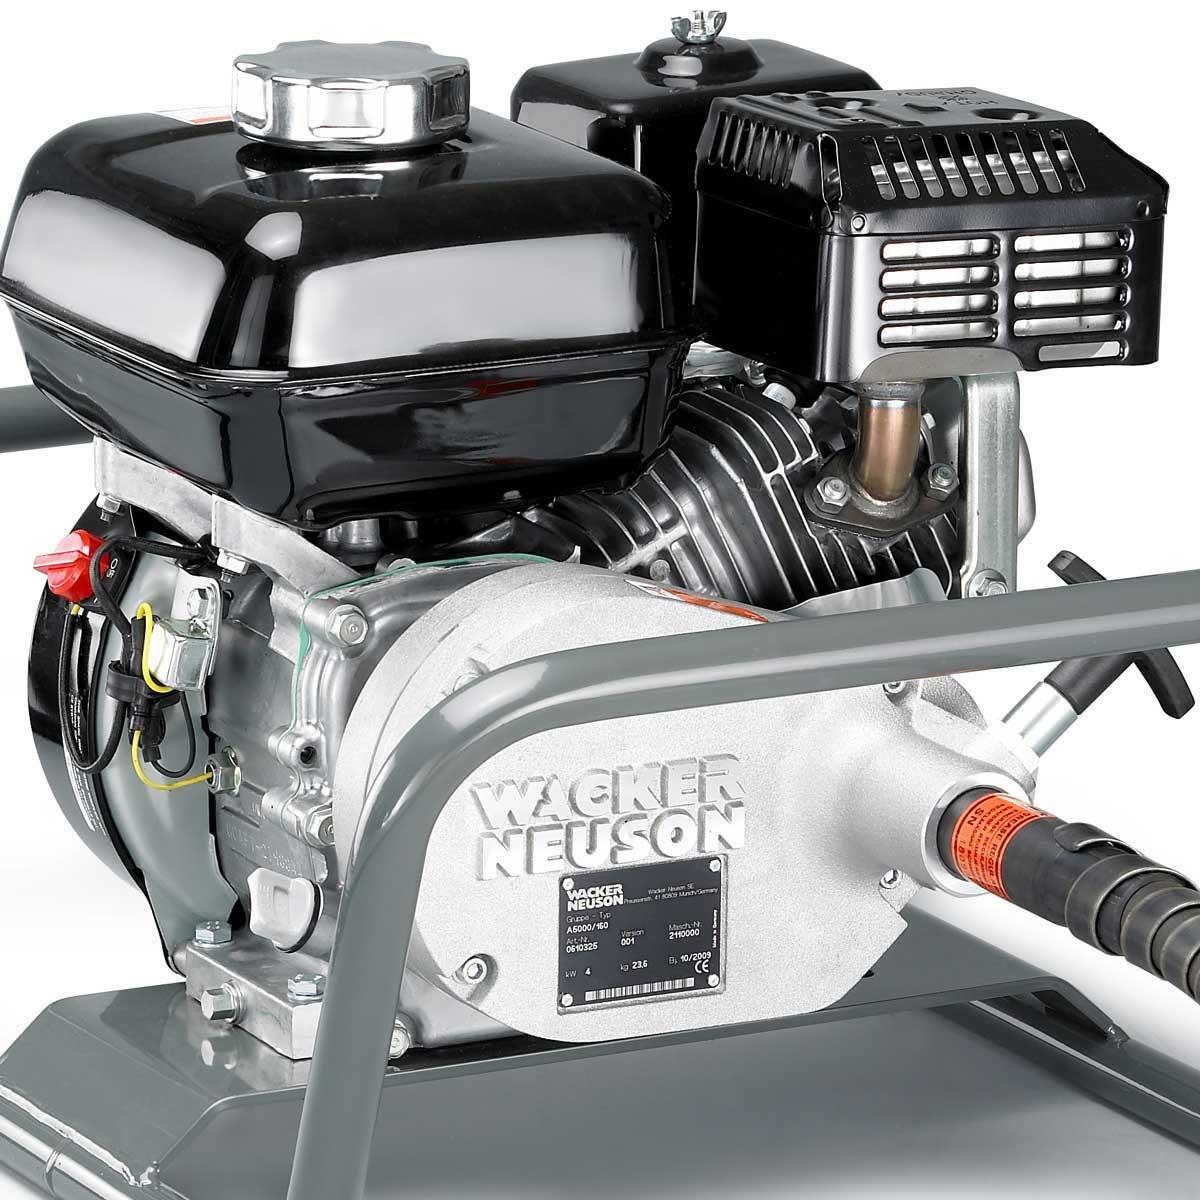 Wacker Neuson A5000 motor